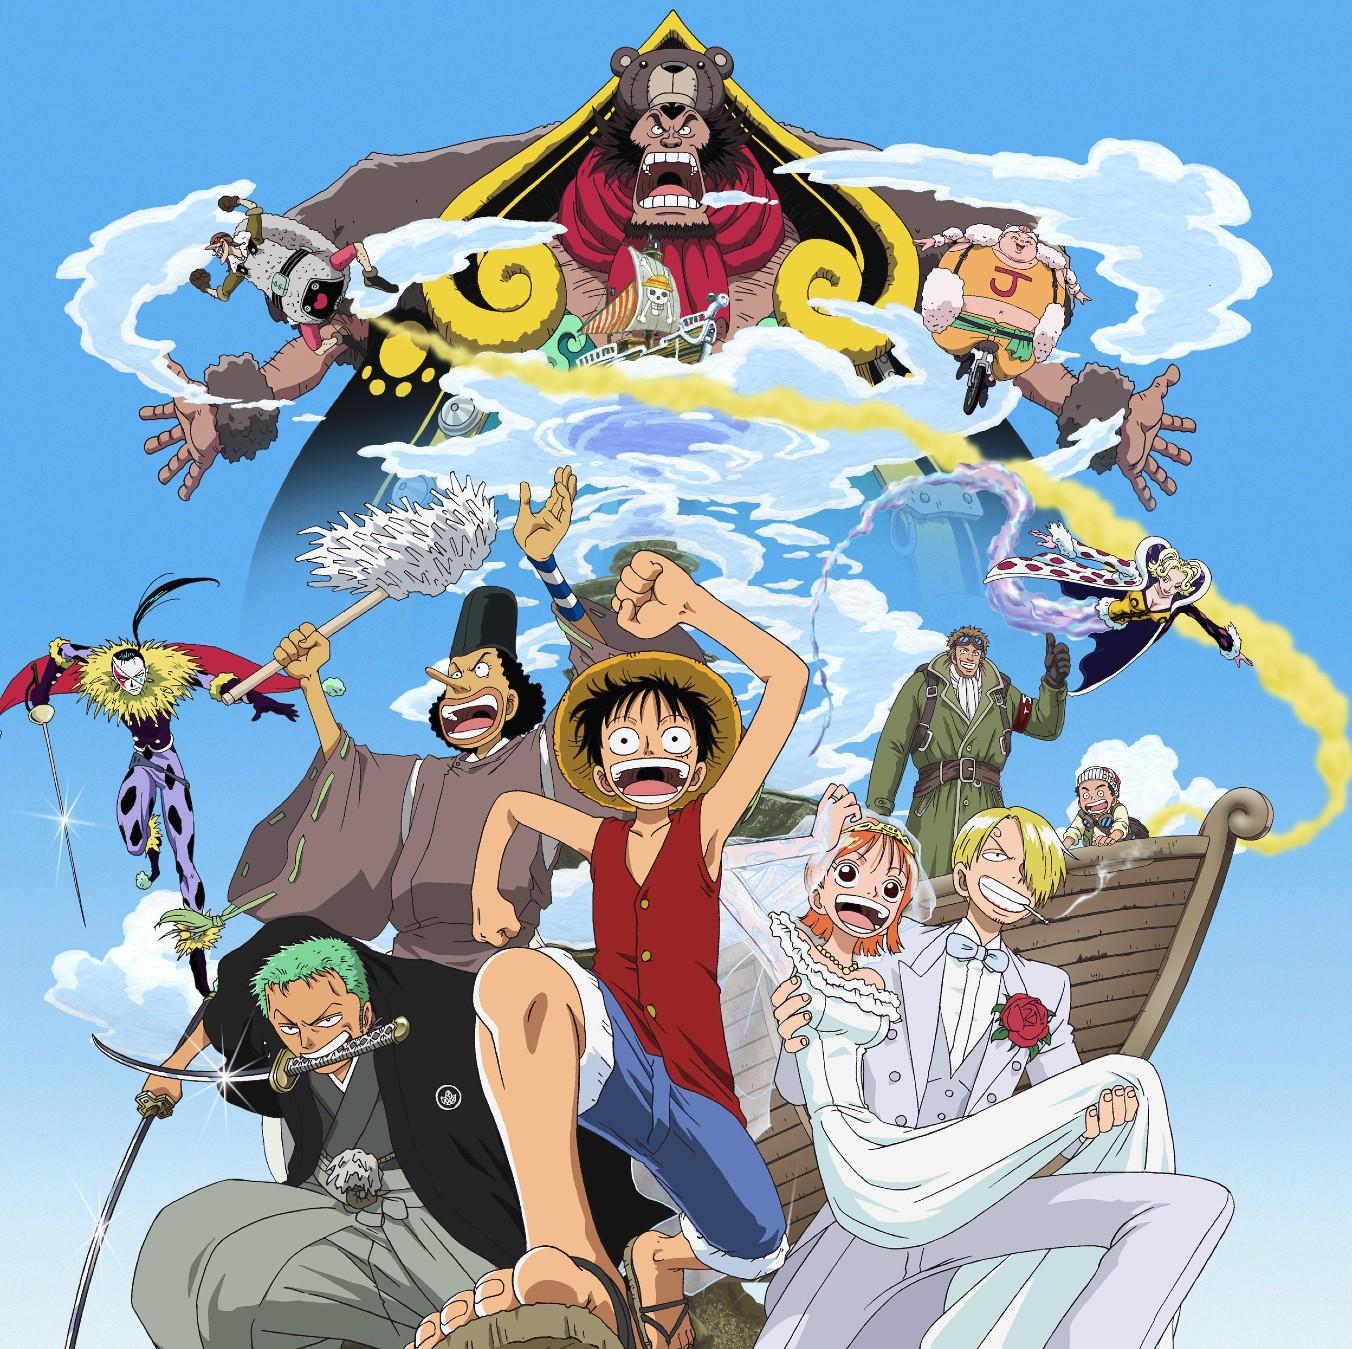 Daftar Movie One Piece Pra-Time Skip, Sudah Ditonton Semua Belum? 4